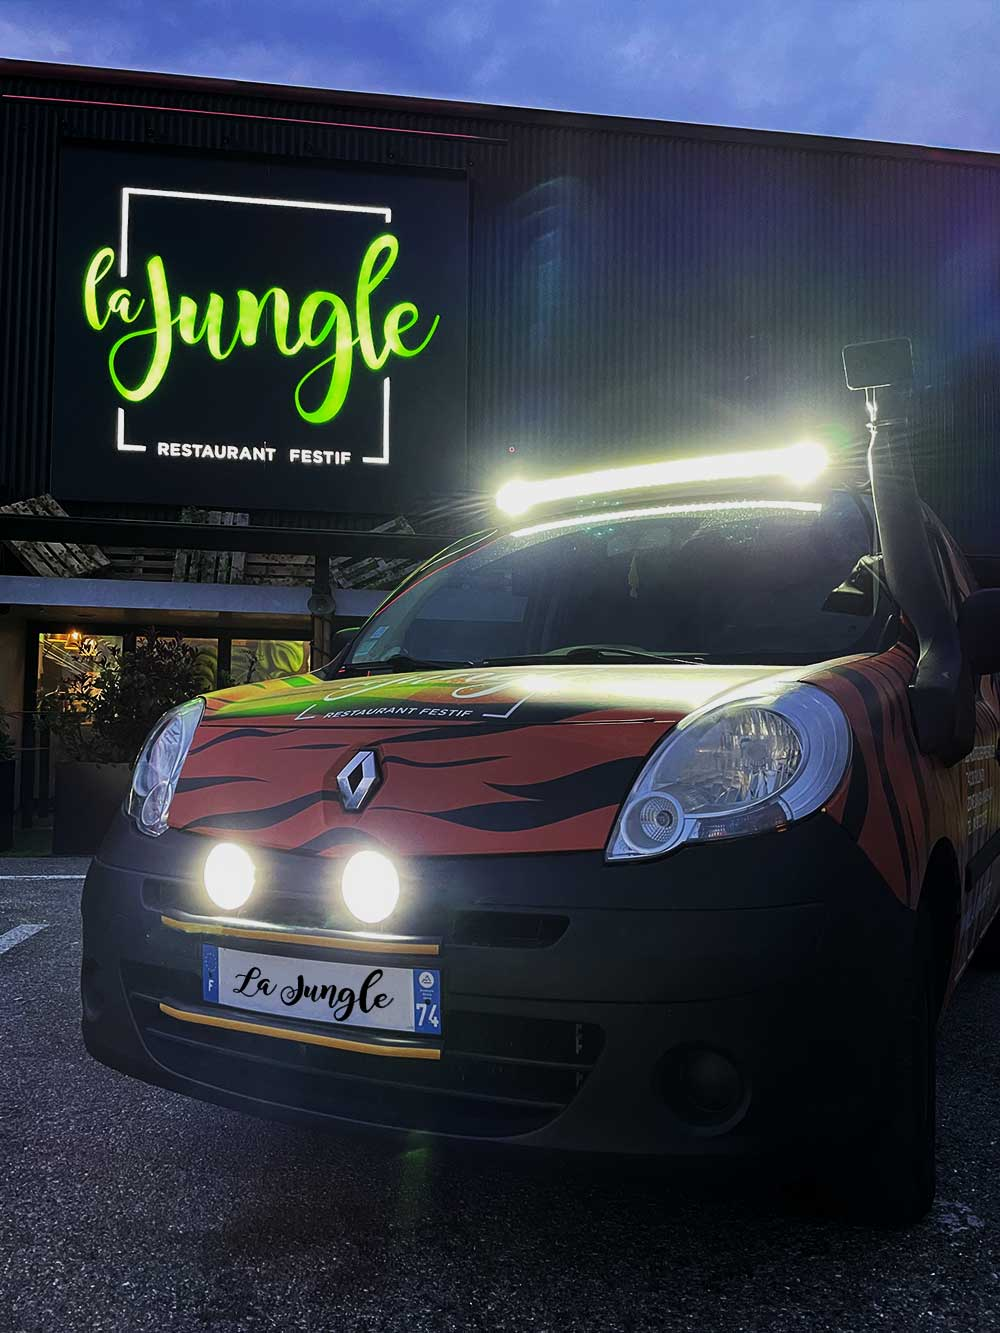 Bar de nuit Epagny Argonay